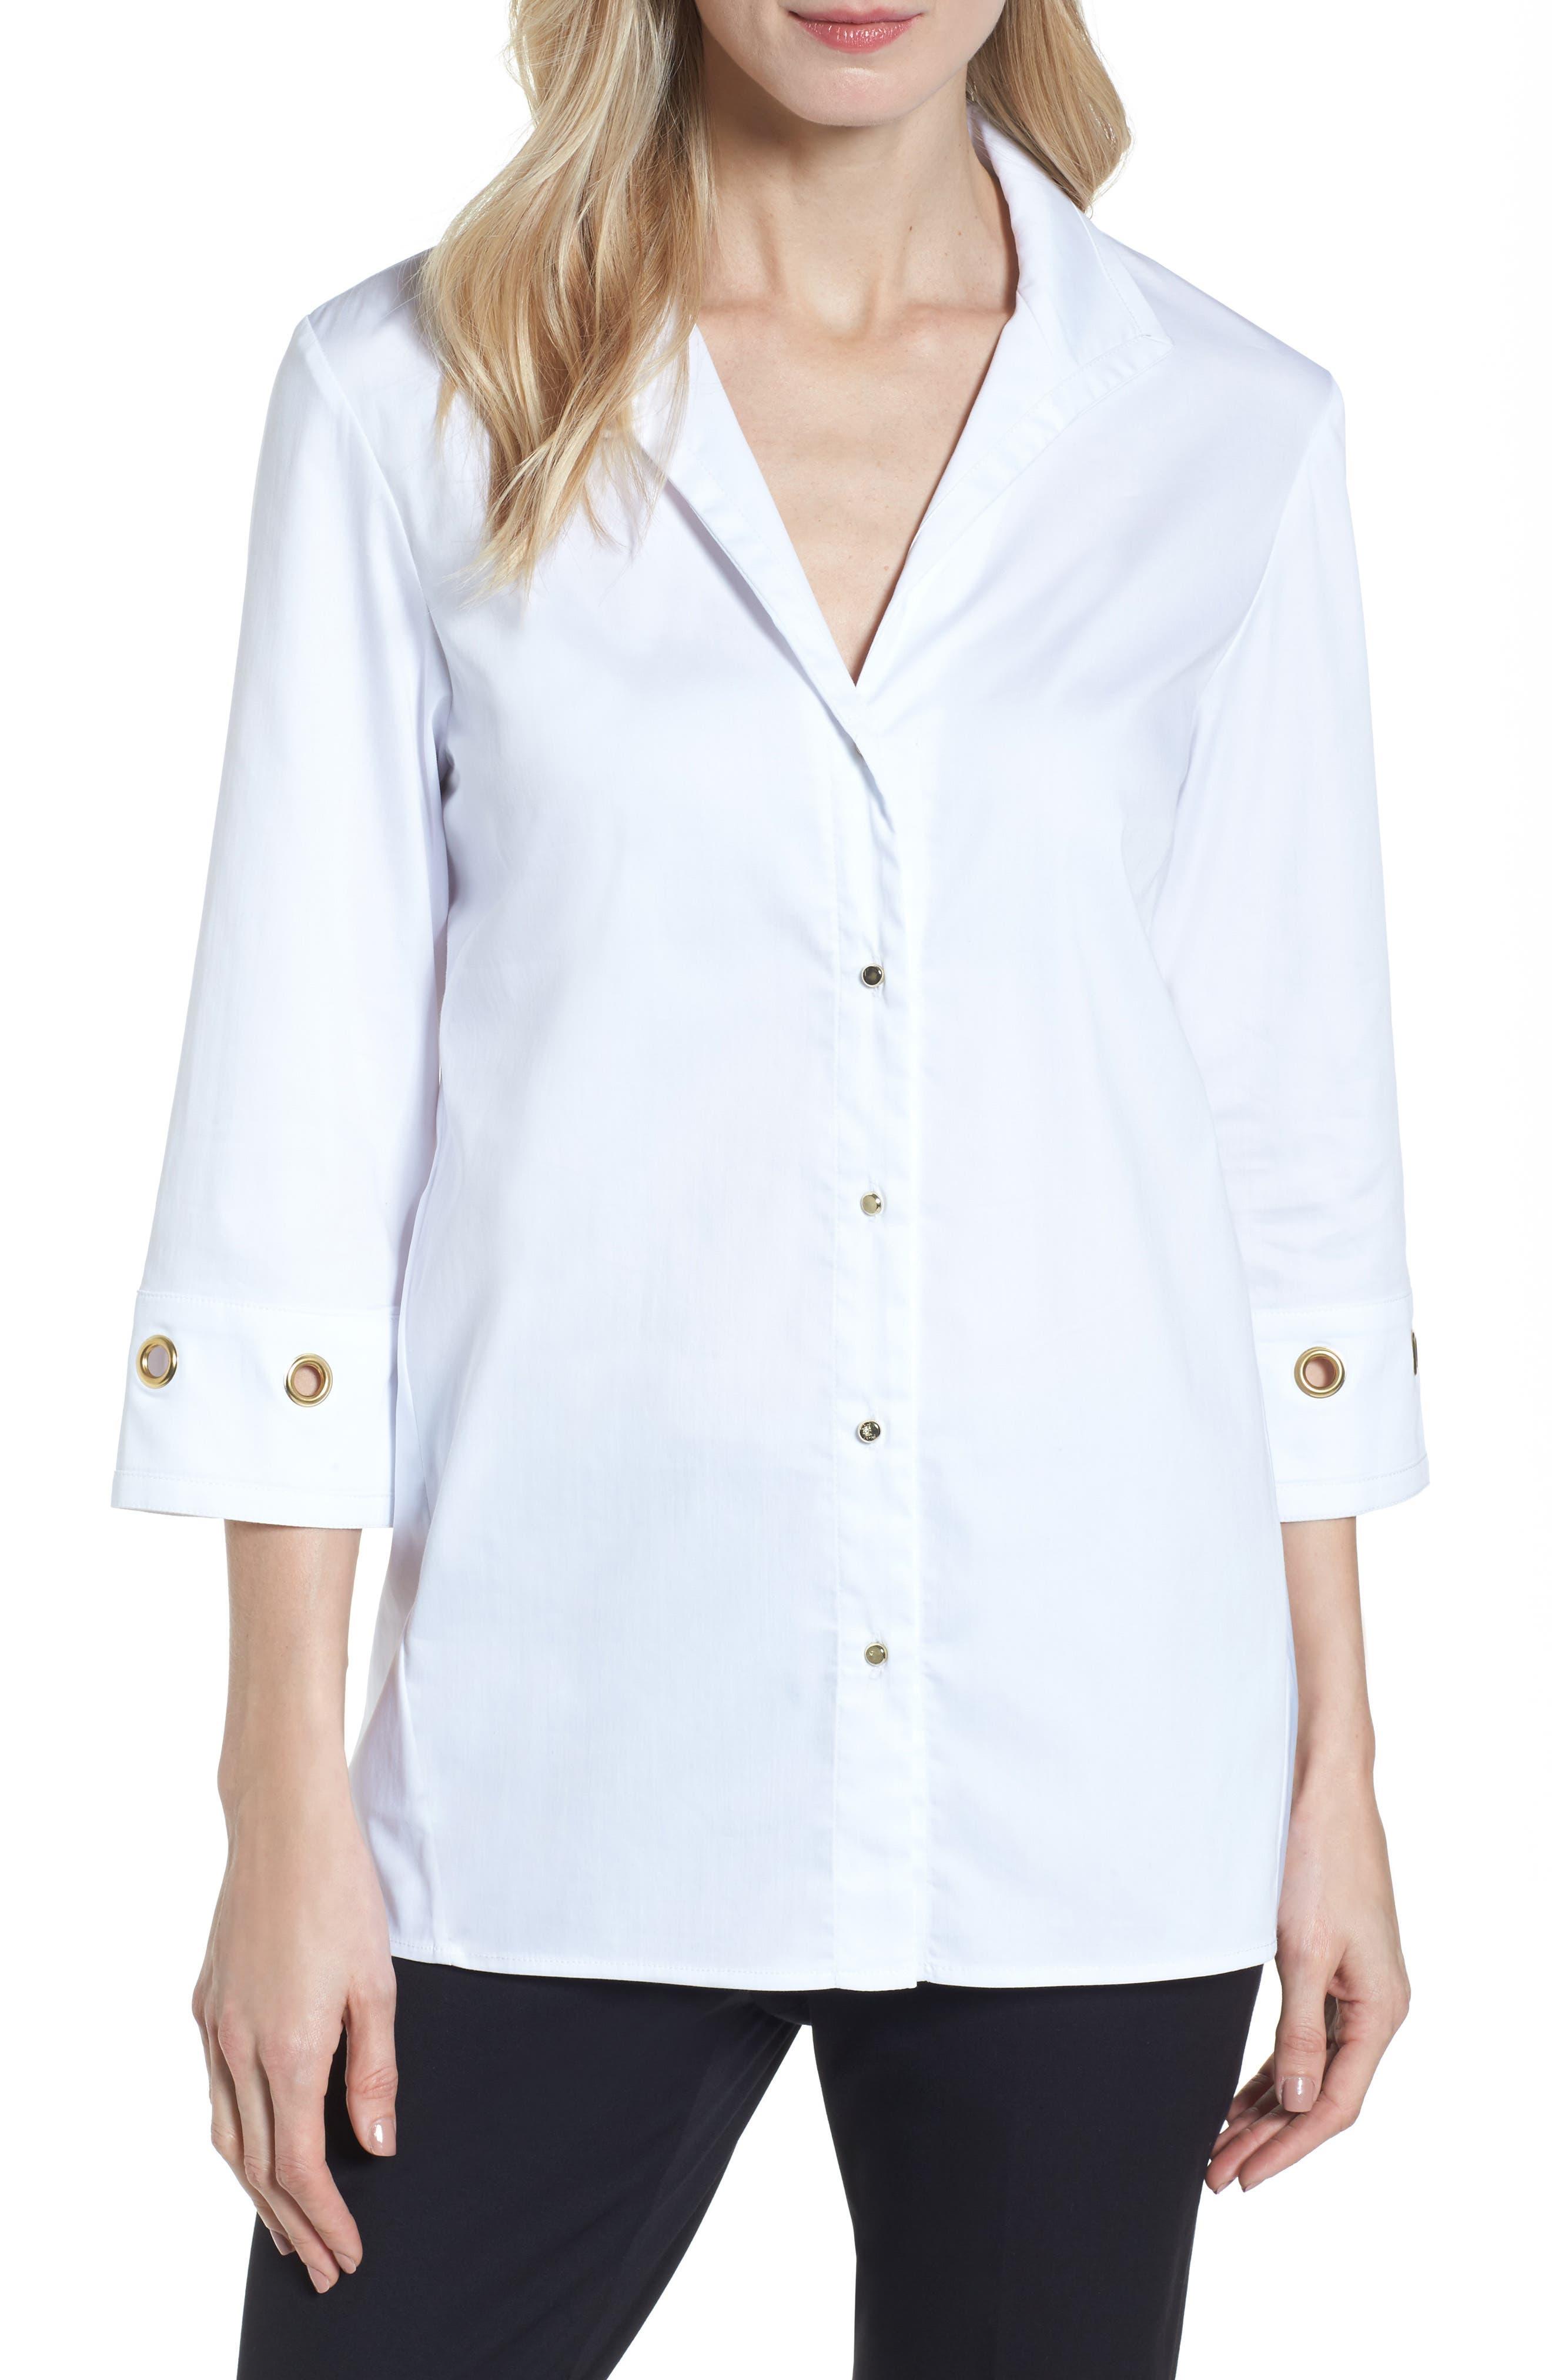 Grommet Sleeve Shirt,                             Main thumbnail 1, color,                             100